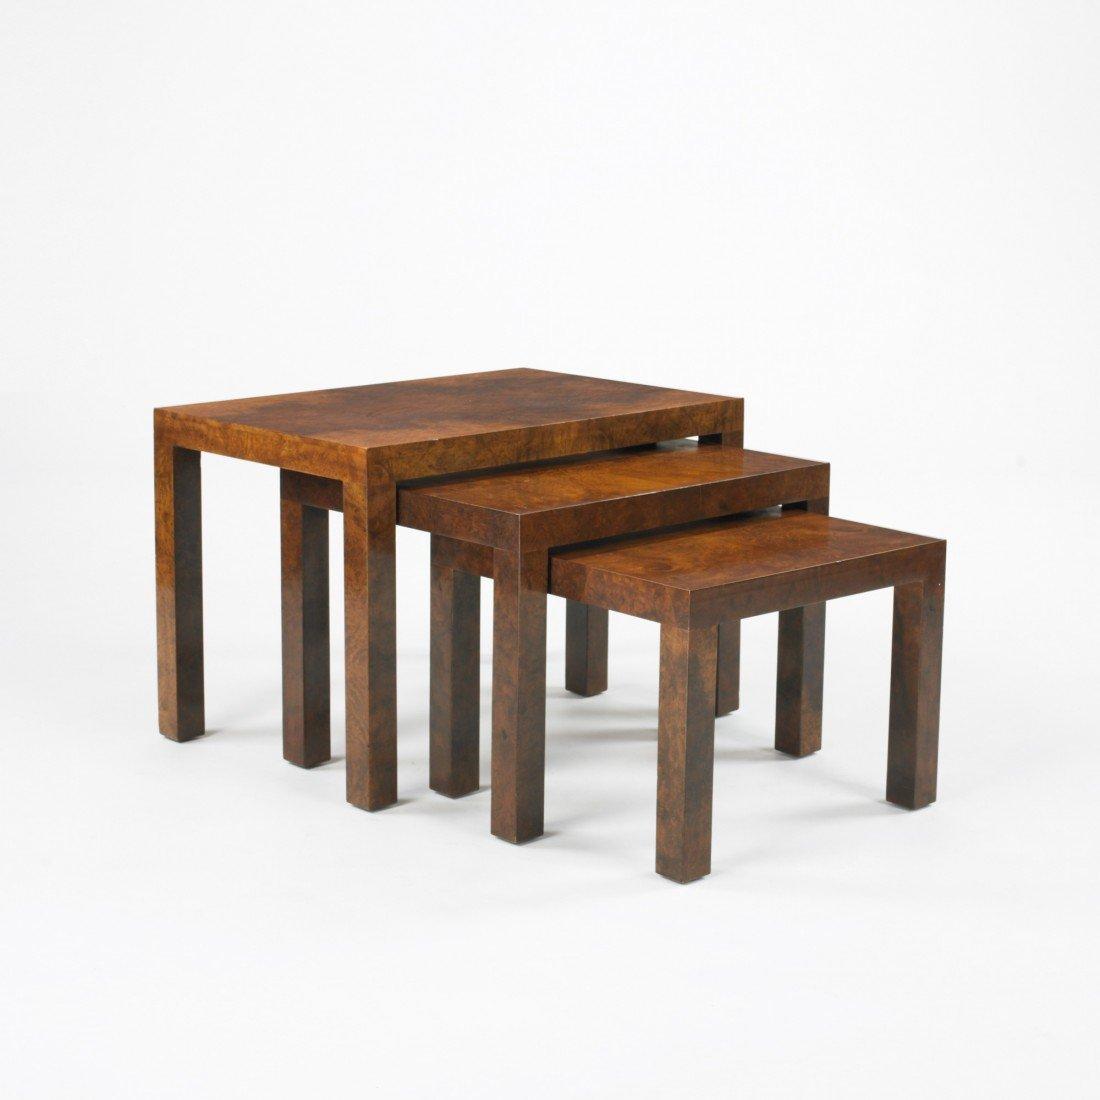 143: Milo Baughman nesting tables model 2694, set of th